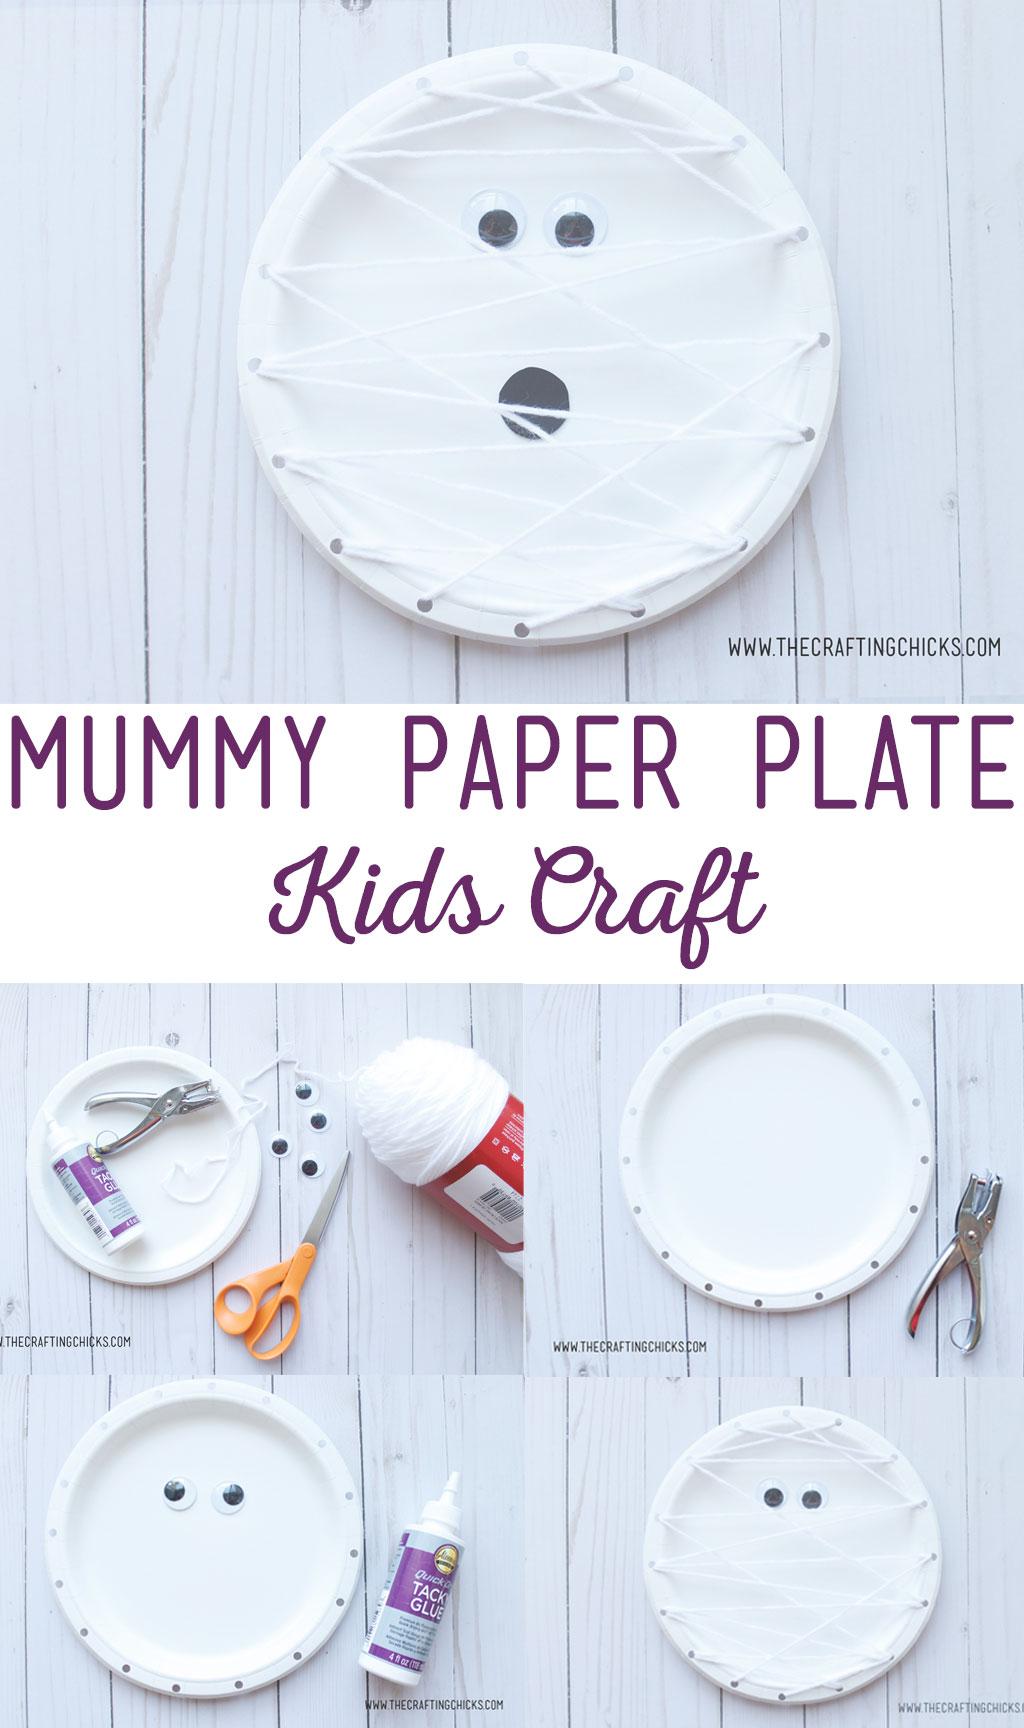 Mummy Paper Plate Kids Craft